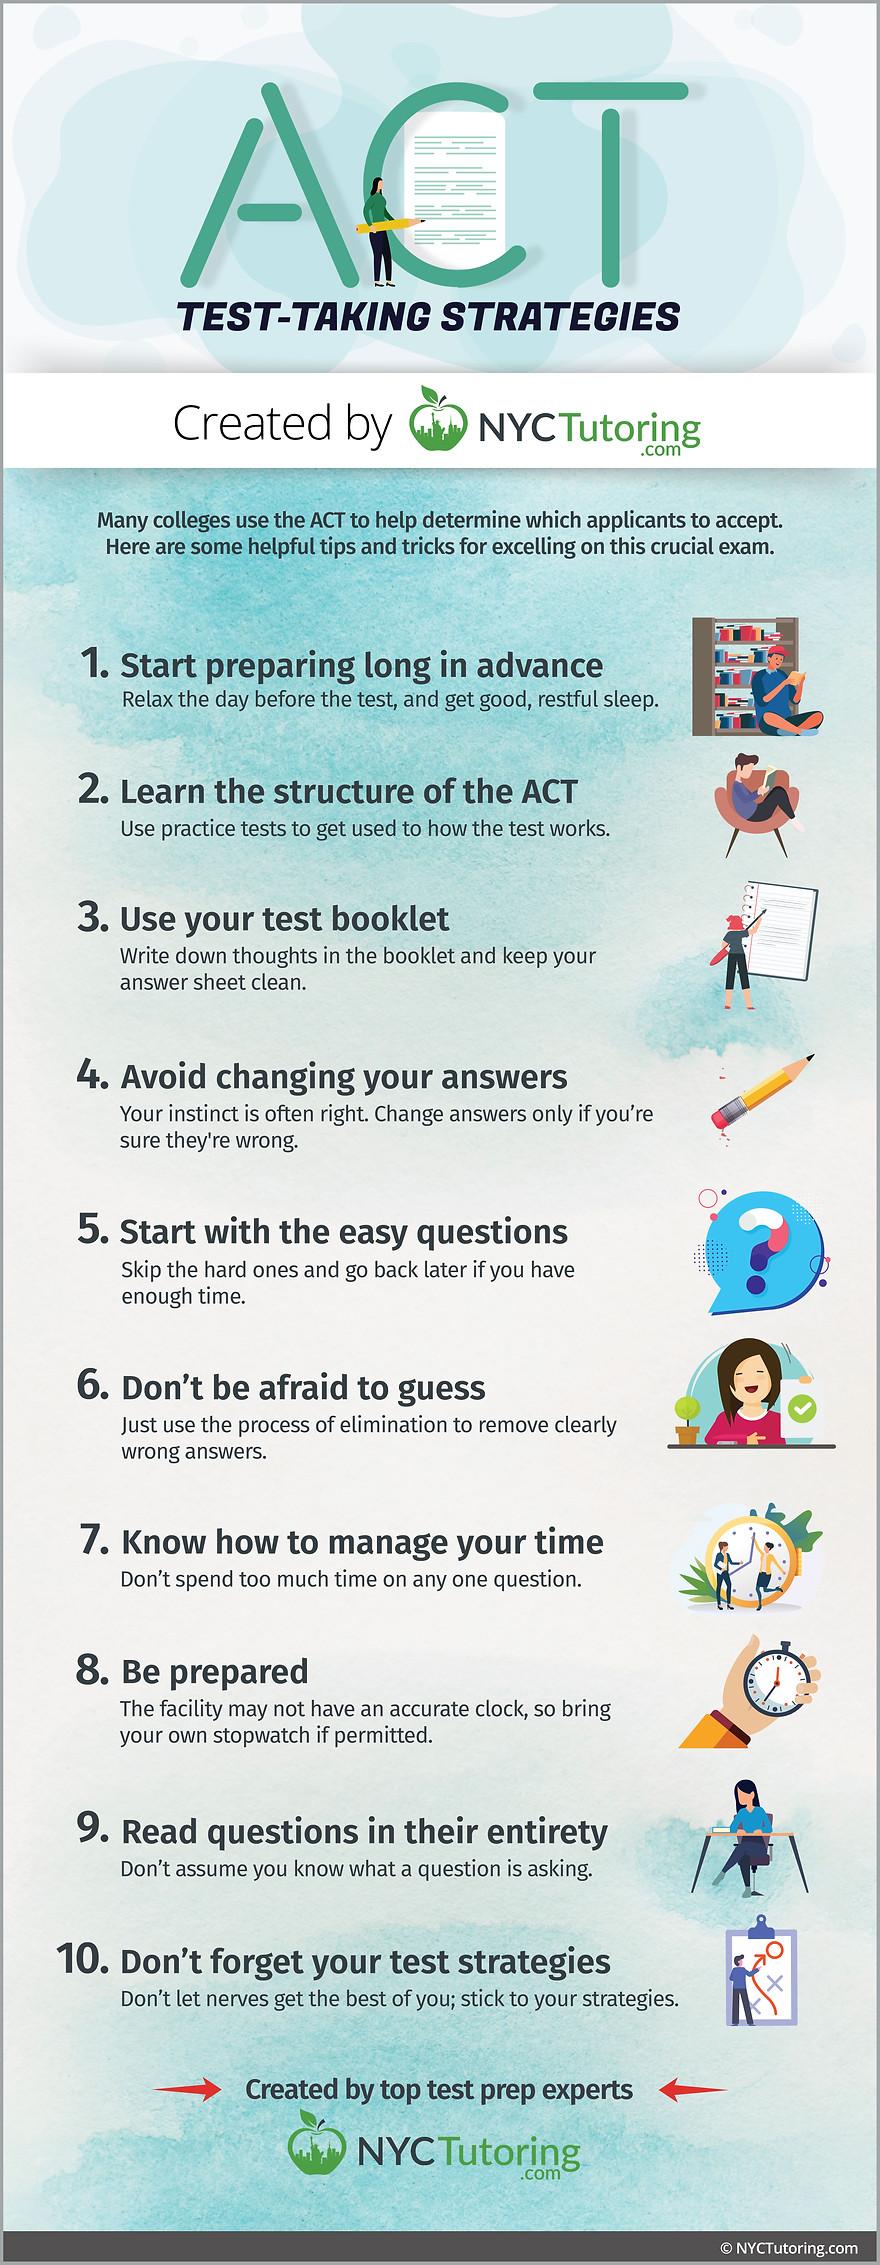 ACT Test-Taking Strategies